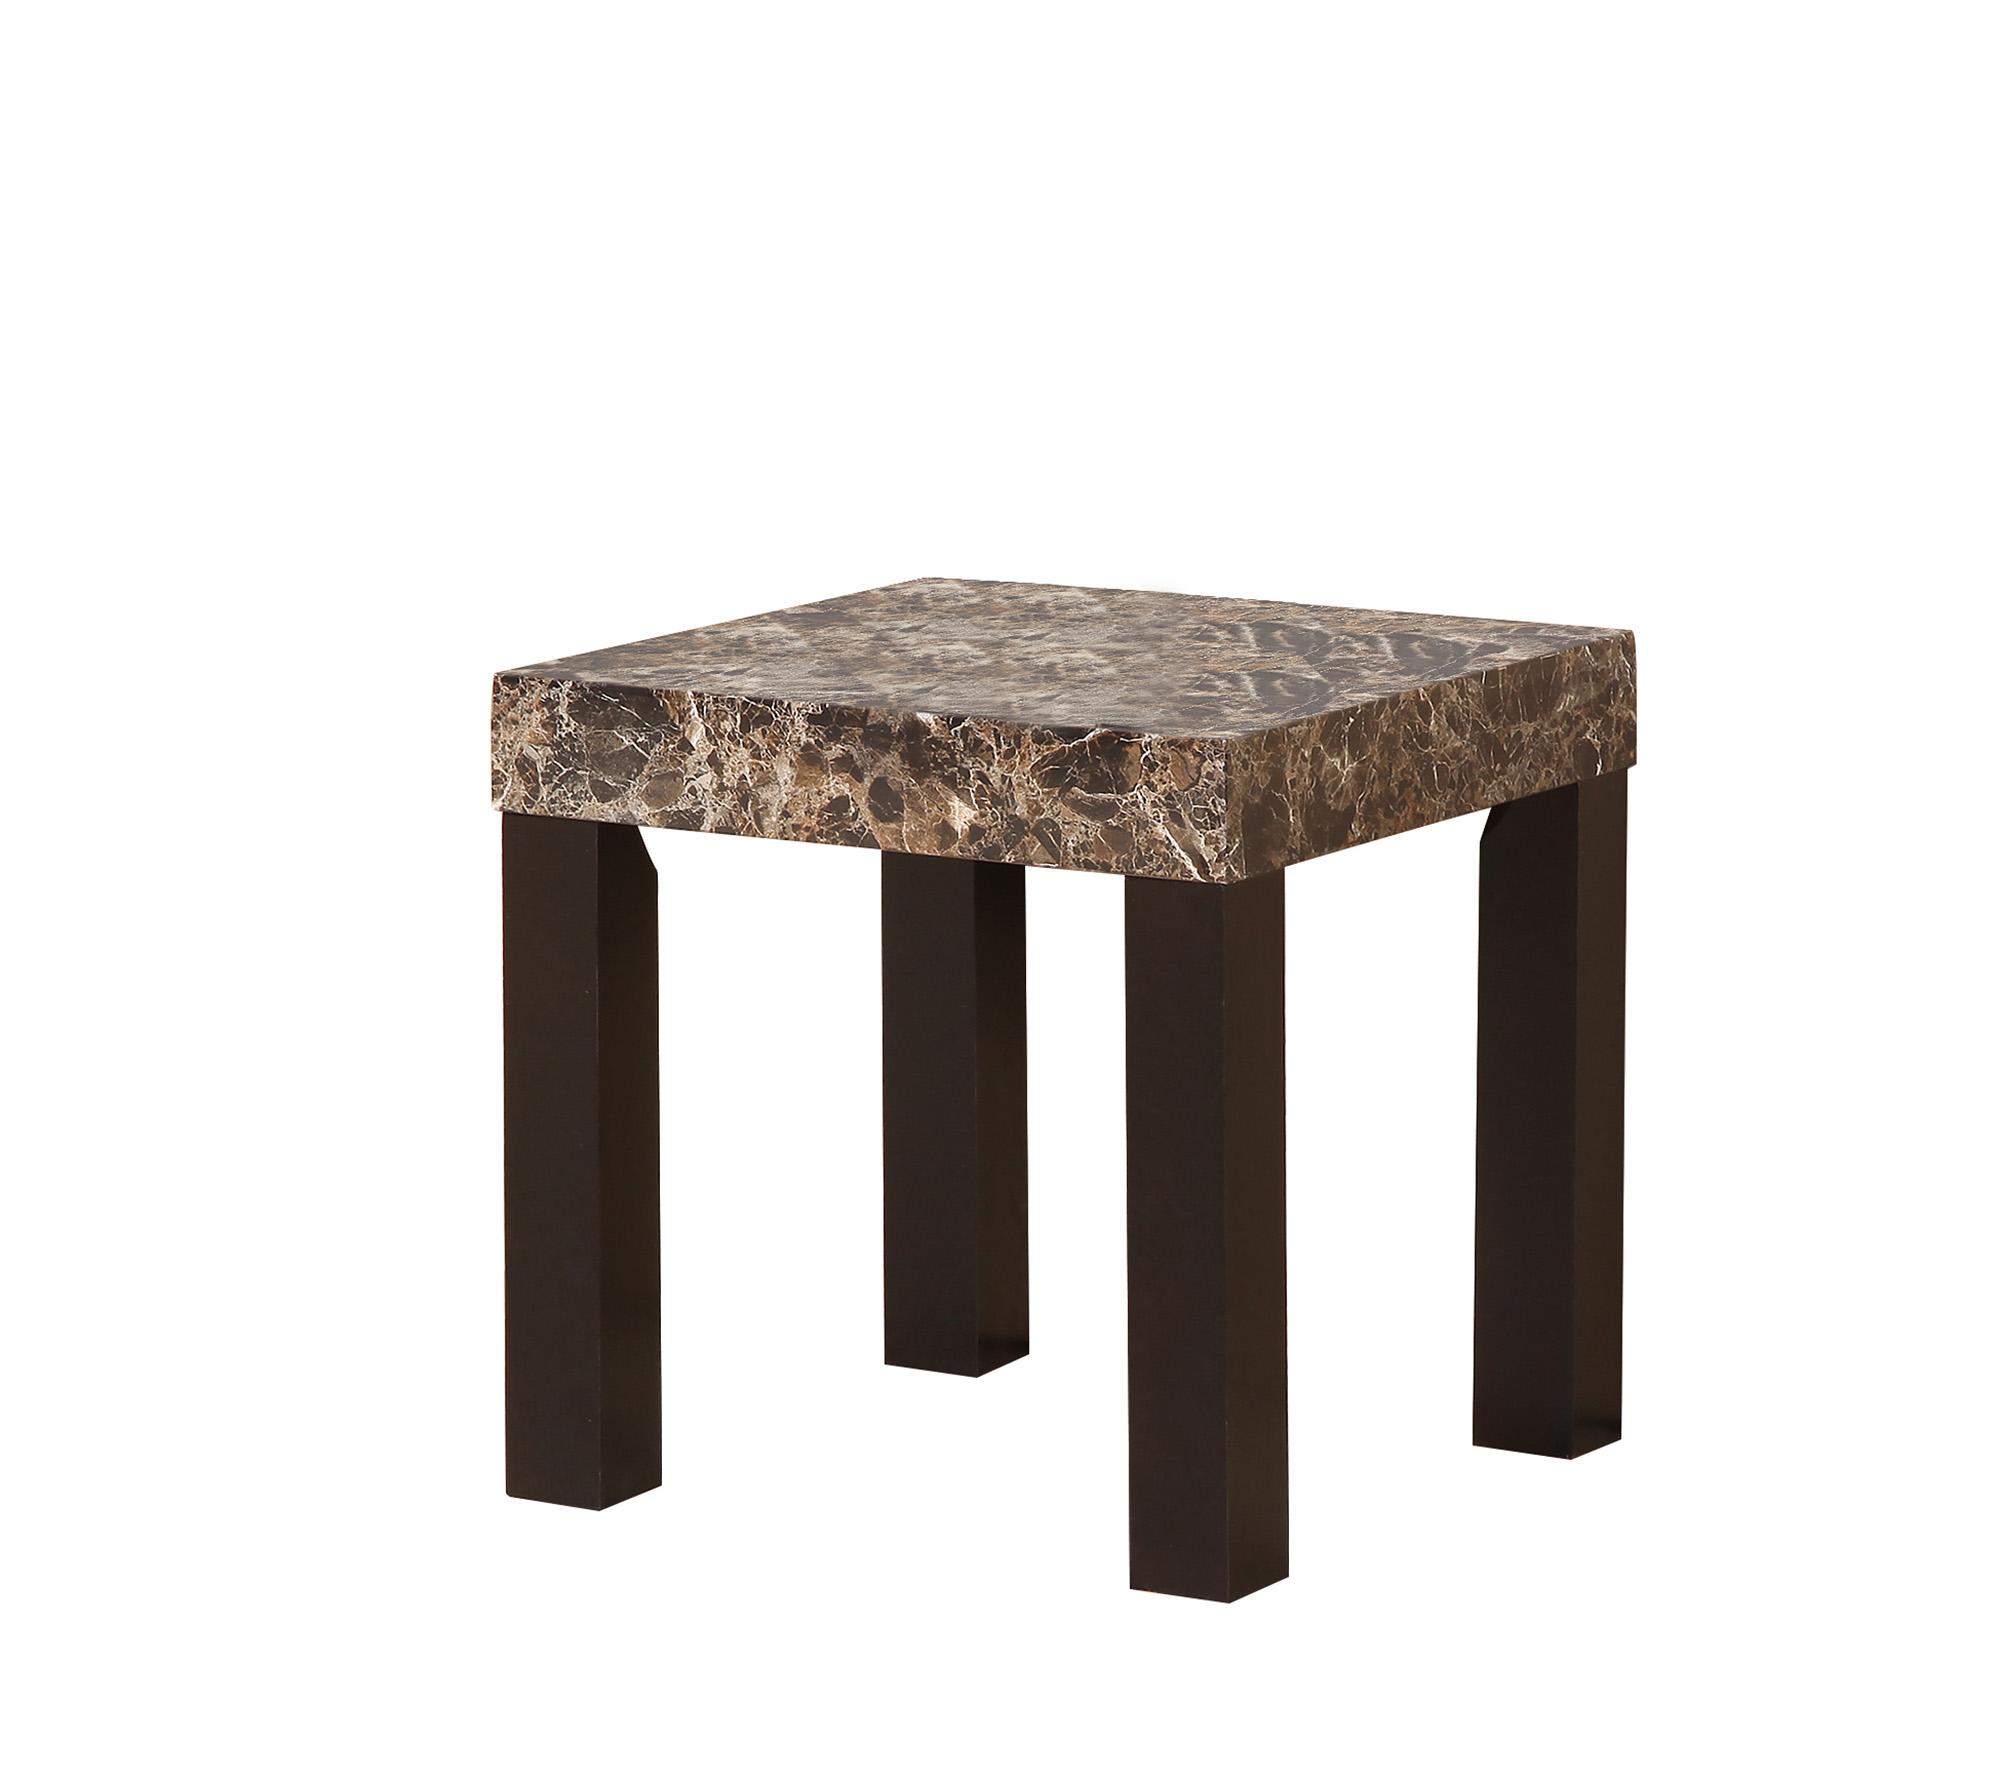 21 5 In Dark Marnee Faux Marbelized Granite Side End Table